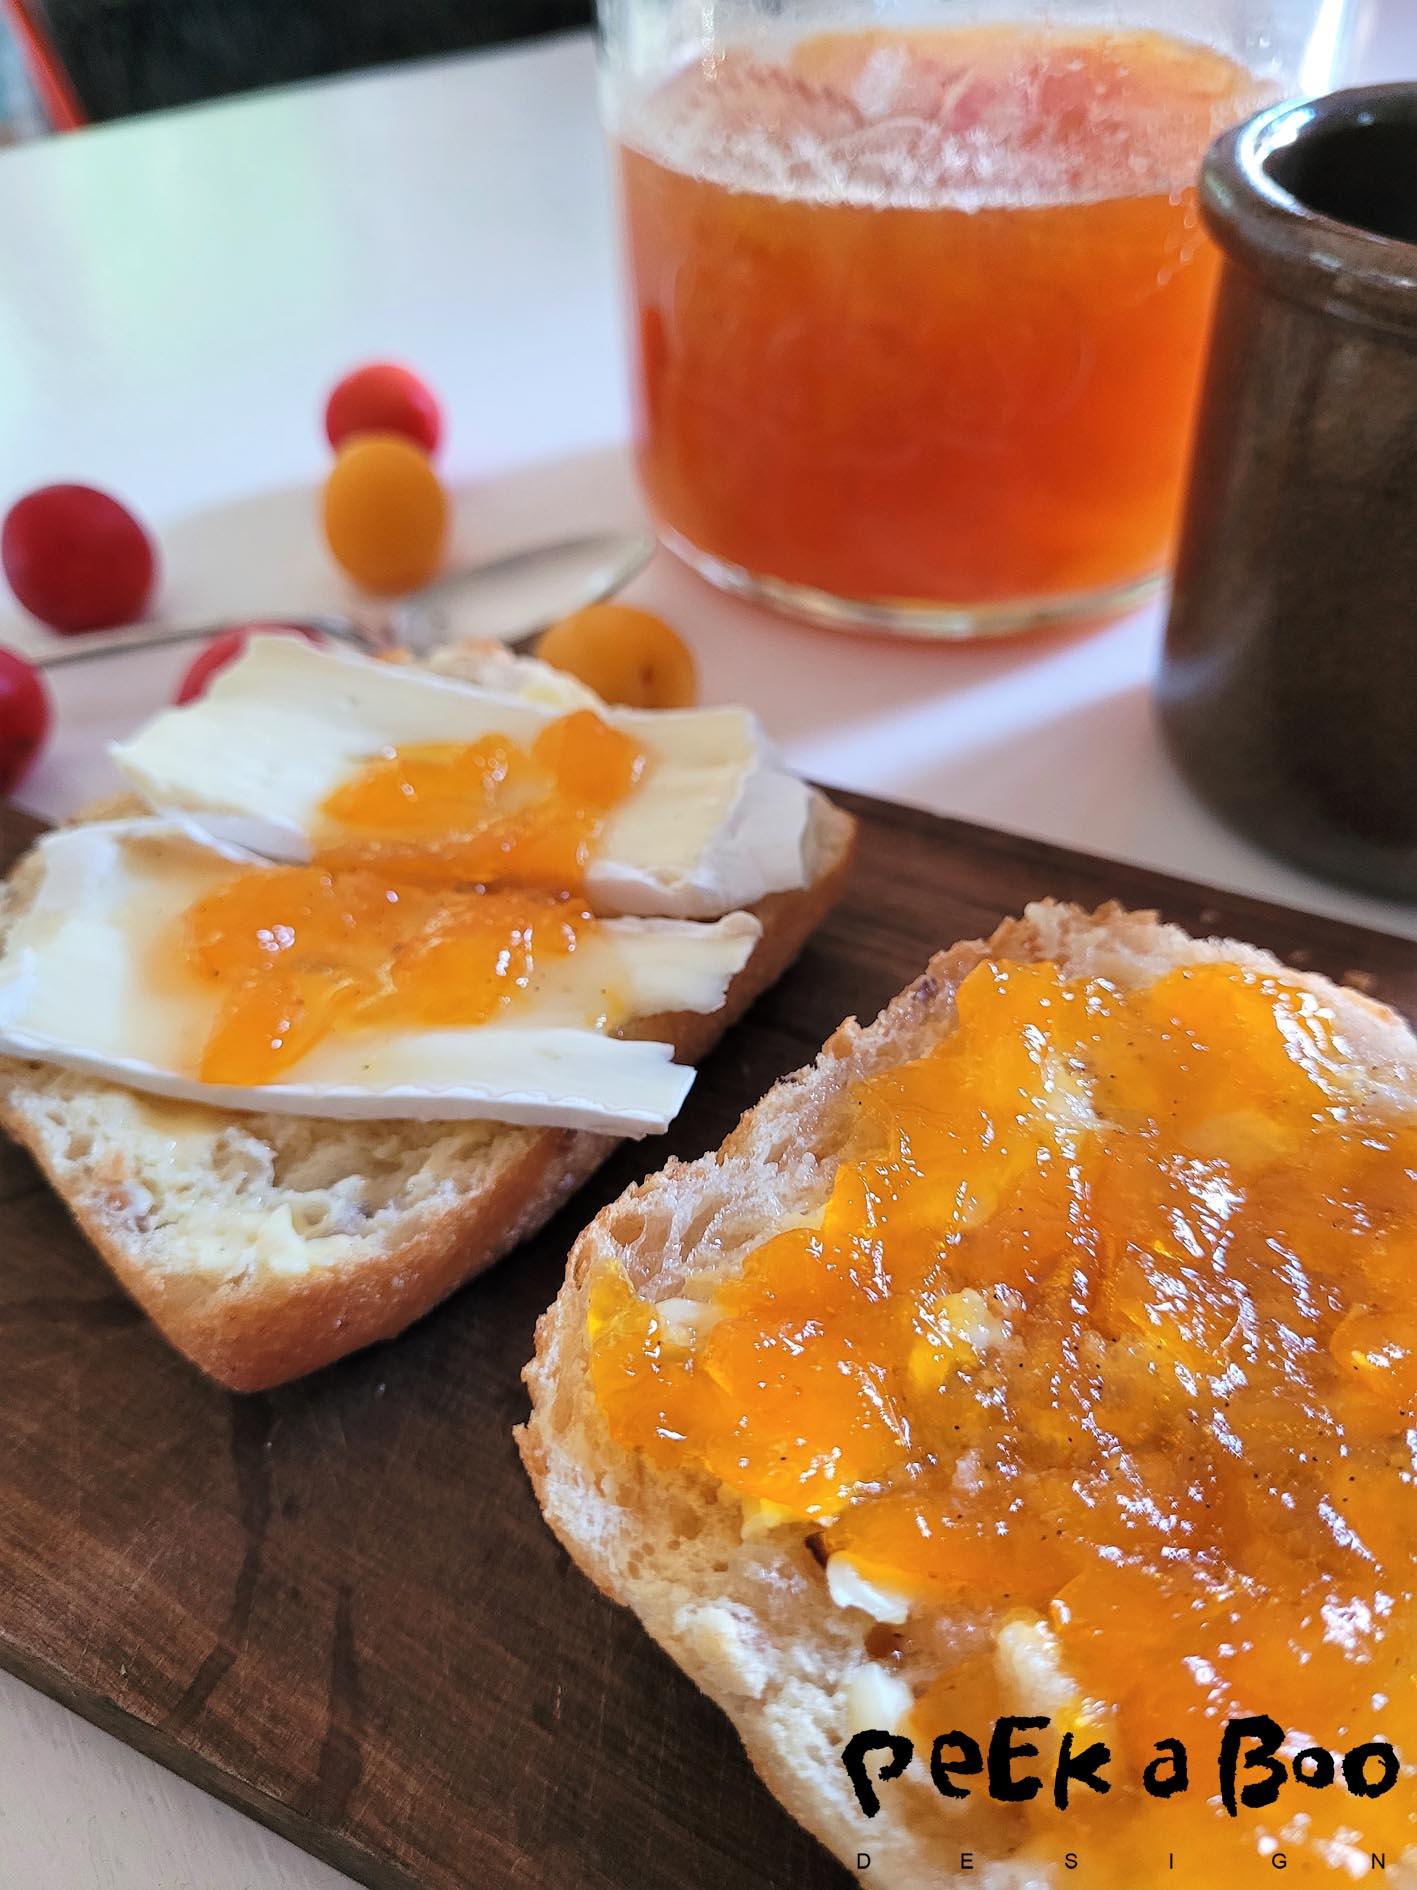 Make you own mirabella jam, see recipe here.